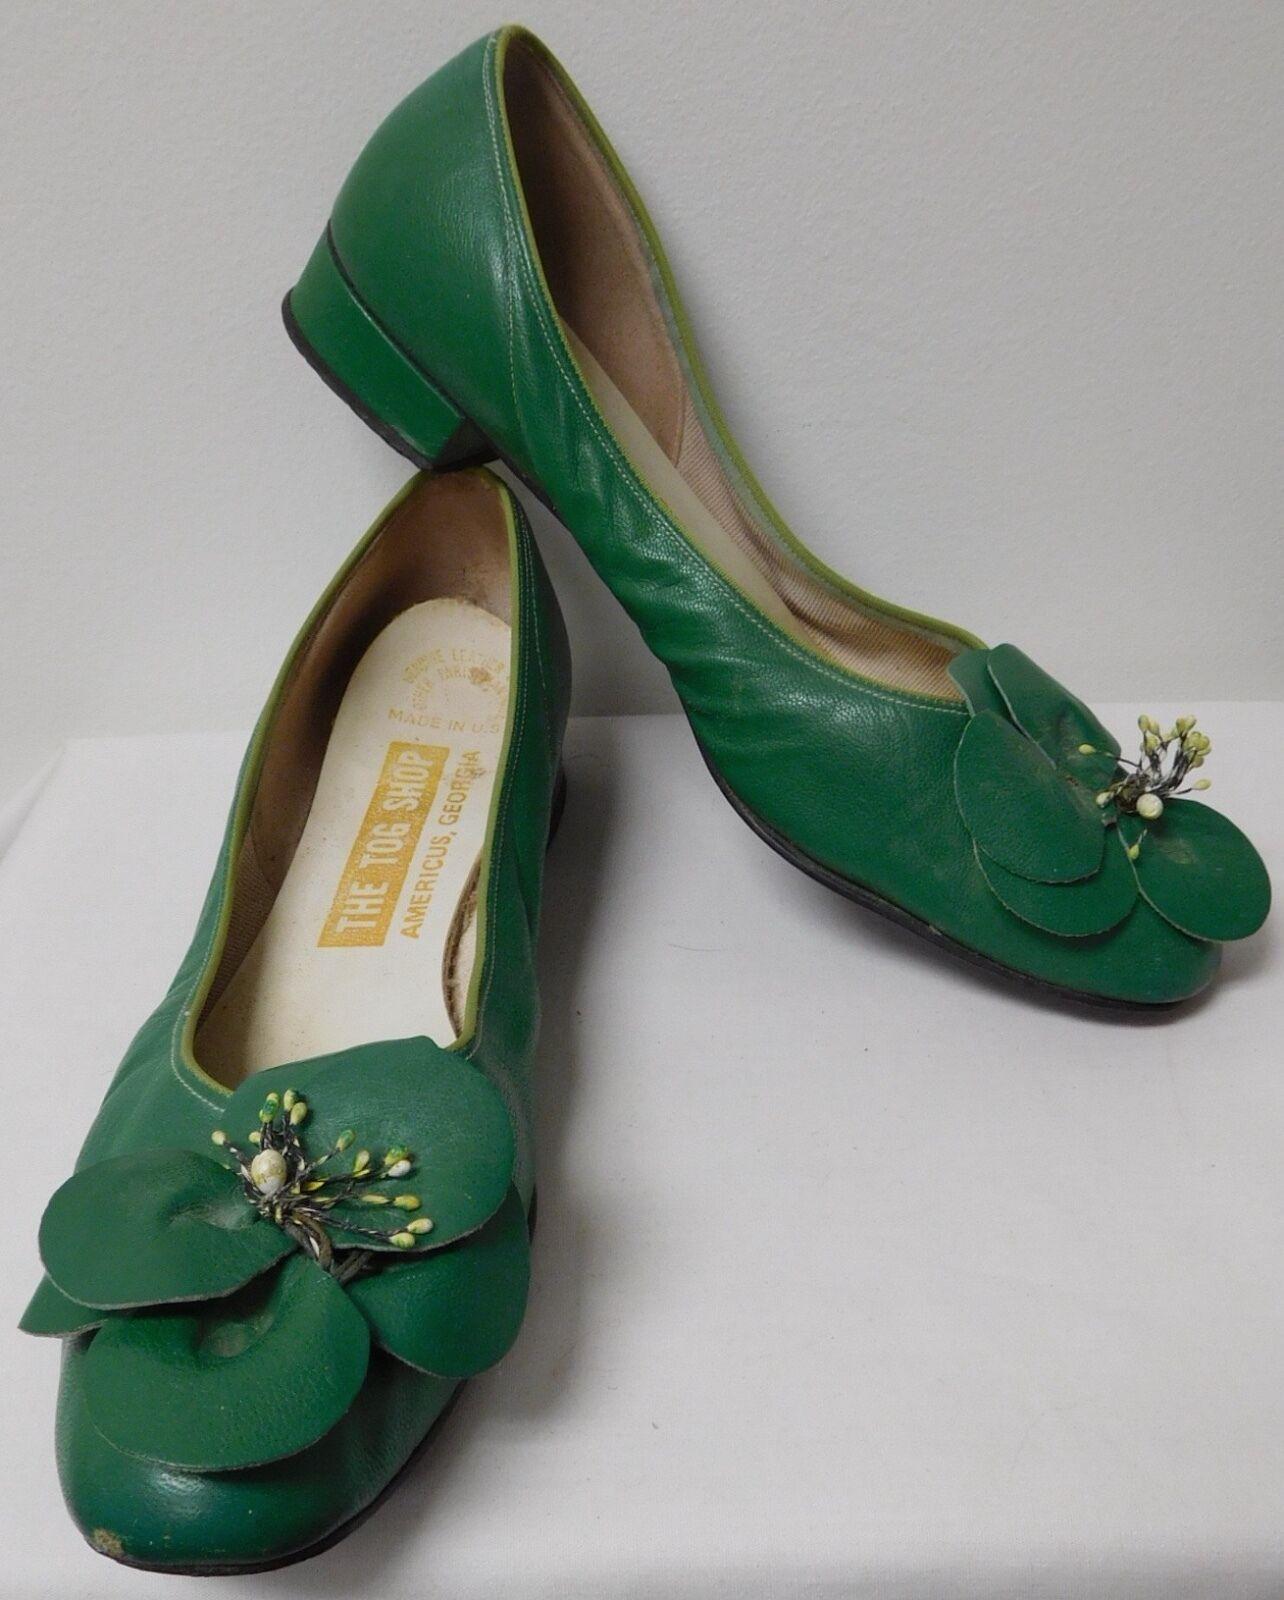 THE TOG SHOP VINTAGE HAMPTONS PREPPY GREEN FLATS W/ FLOWER TOE Donna SIZE 9.5 N